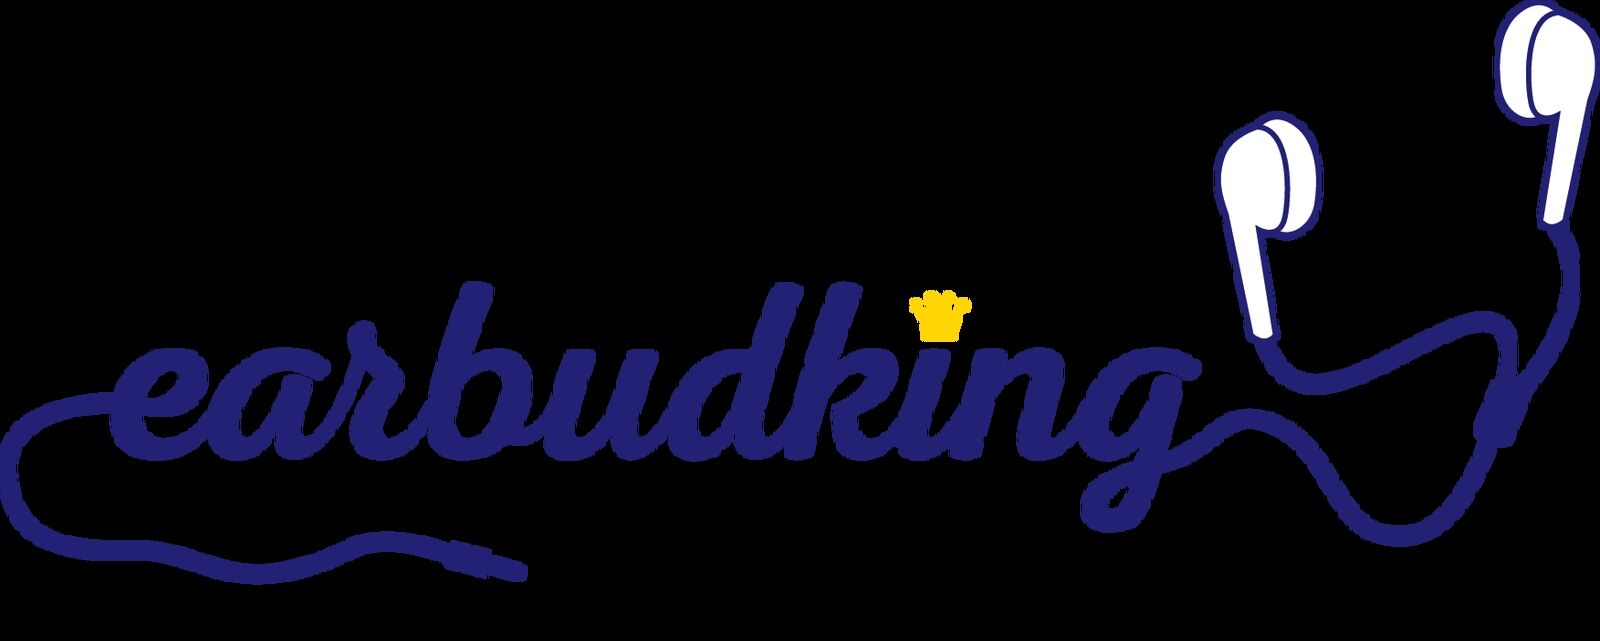 Earbud King